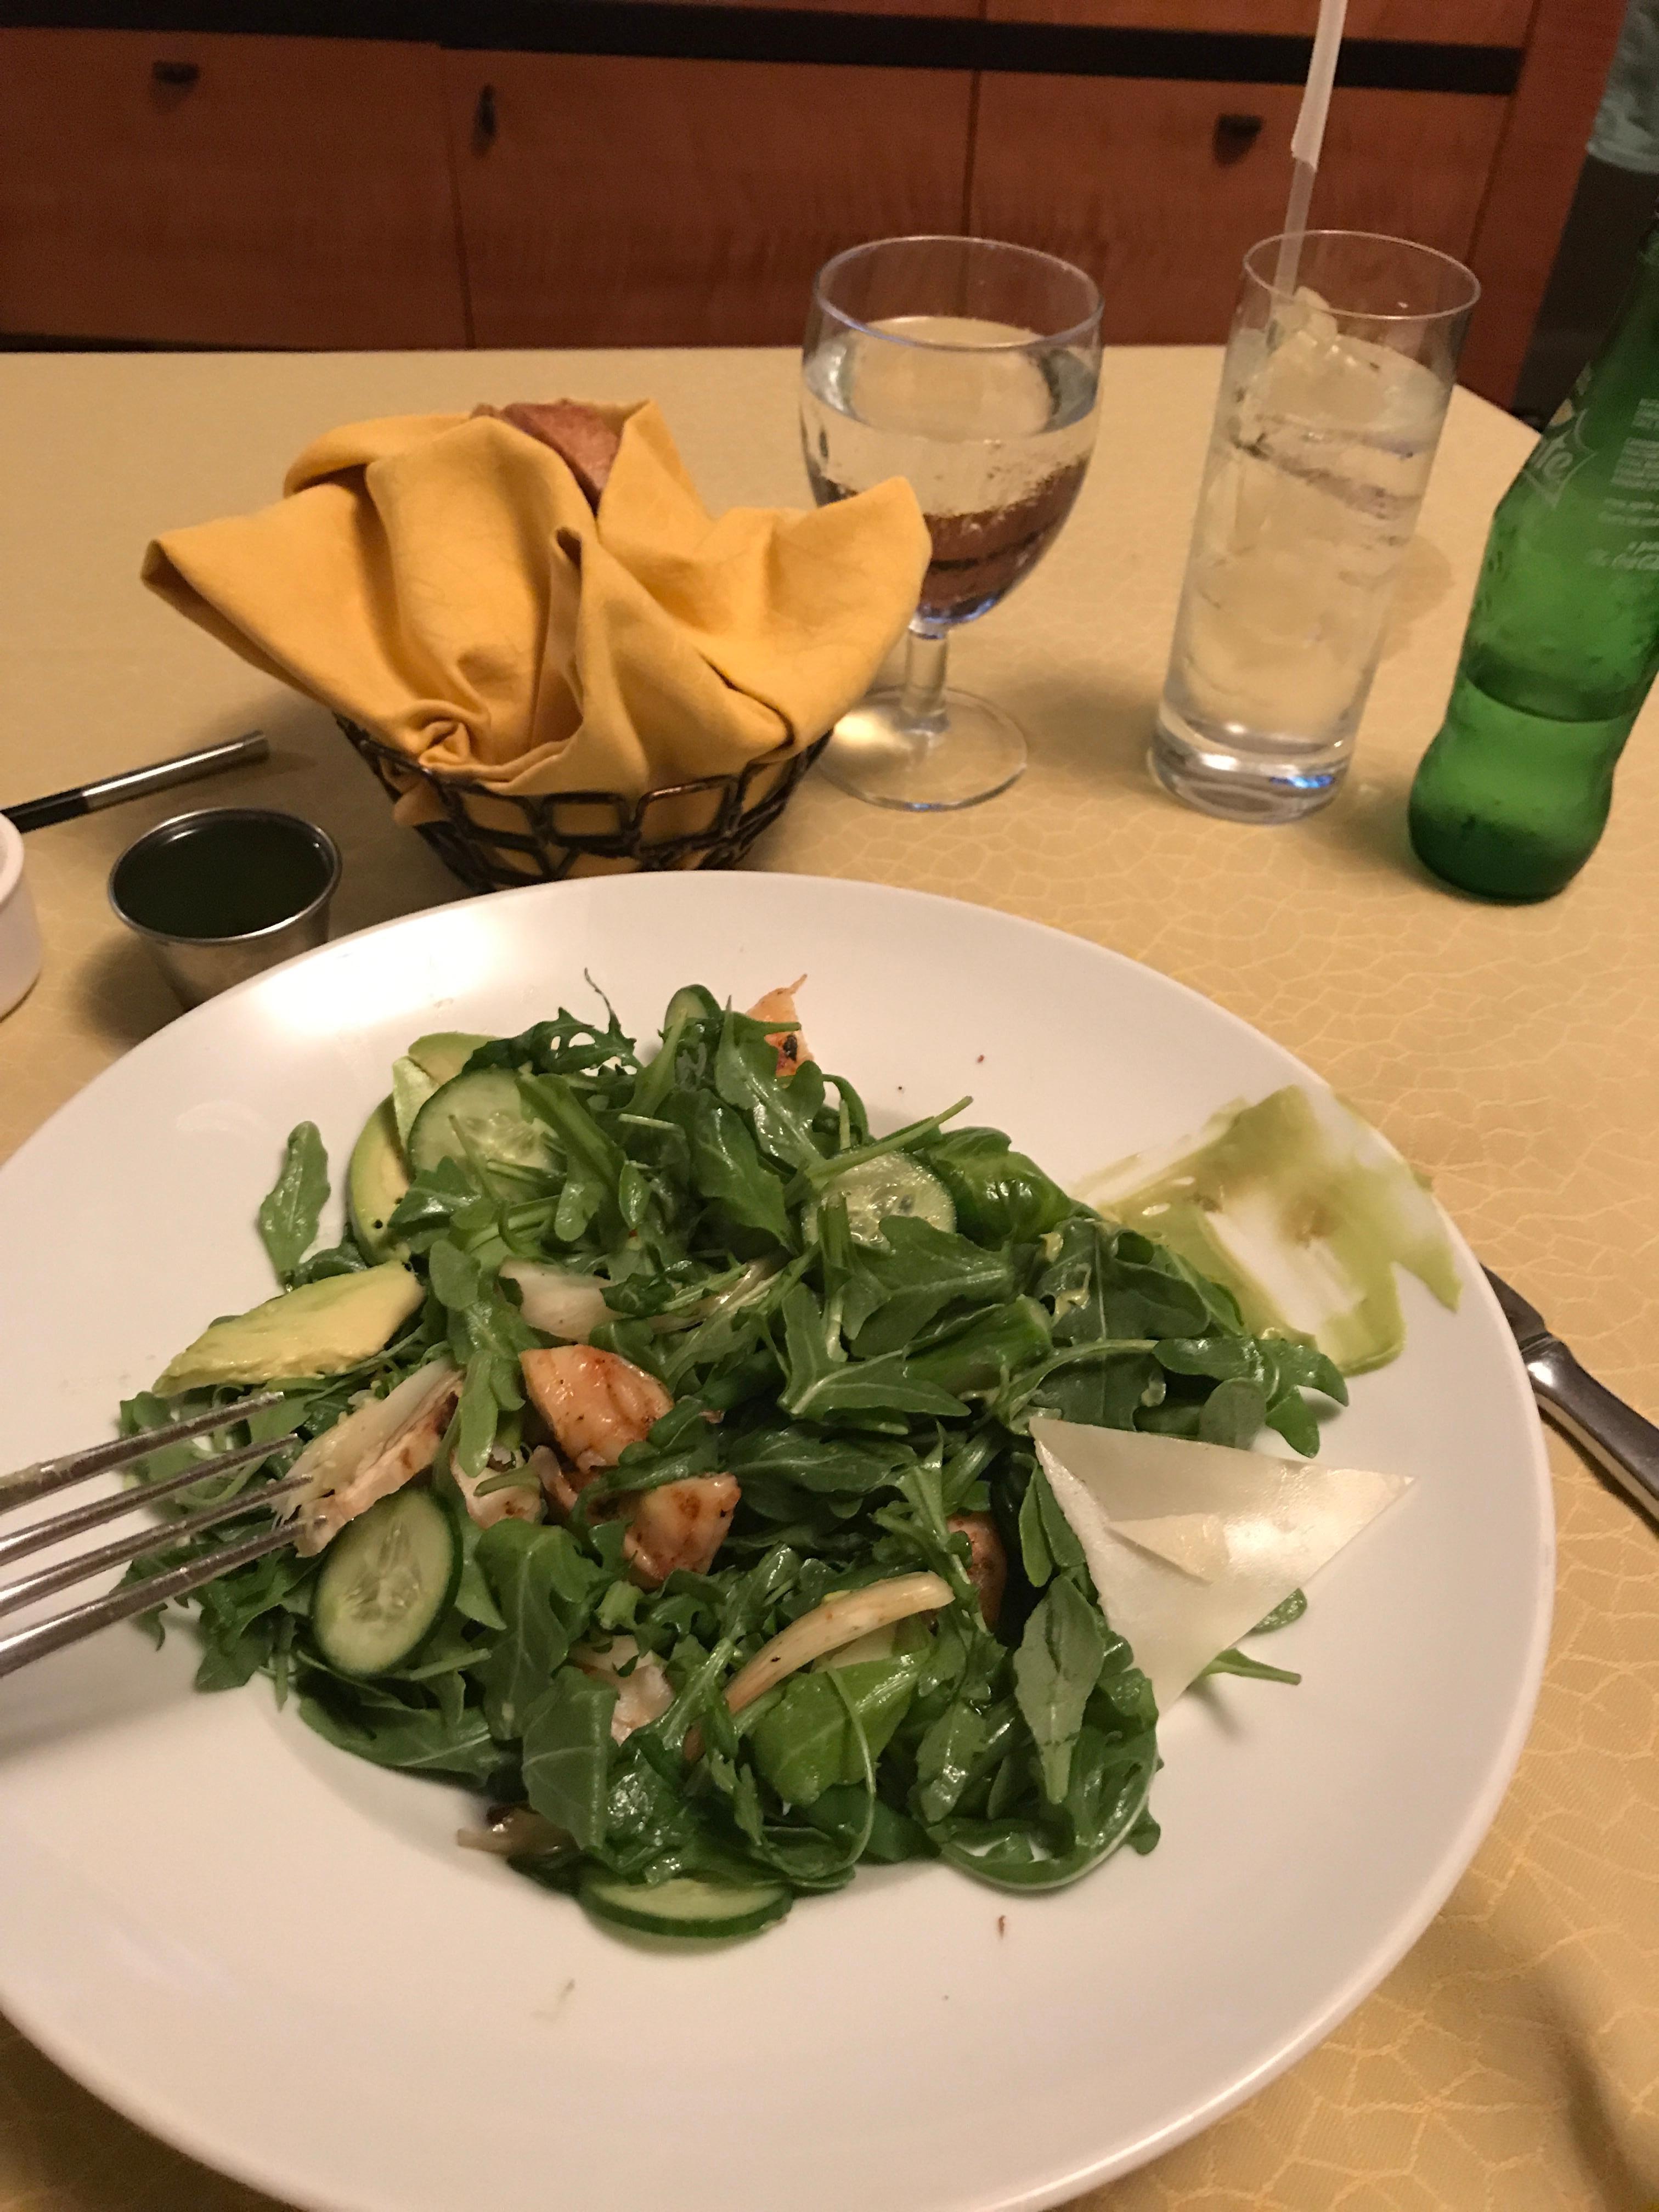 This salad was delicious!